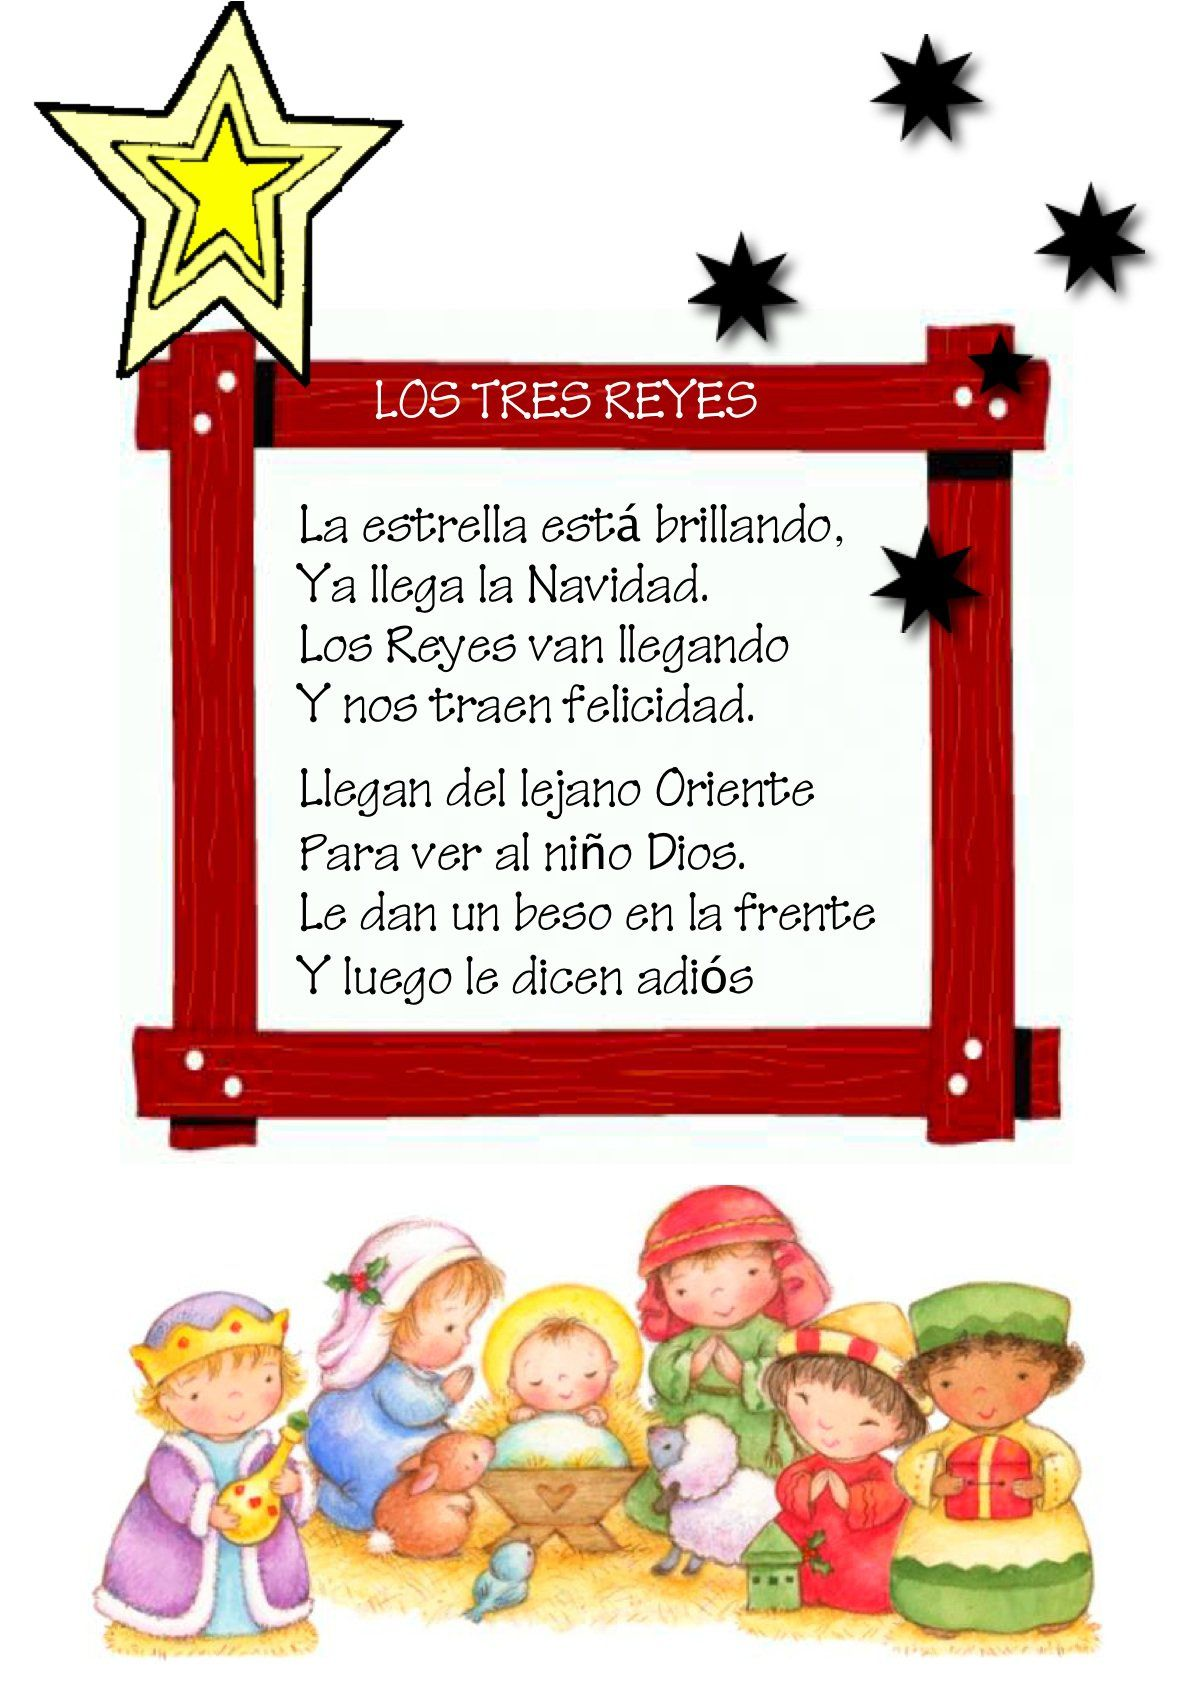 Dibujos Para Tarjetas De Navidad Para Ninos.Frases De Navidad Para Ninos Divertidas Poesias Navidad